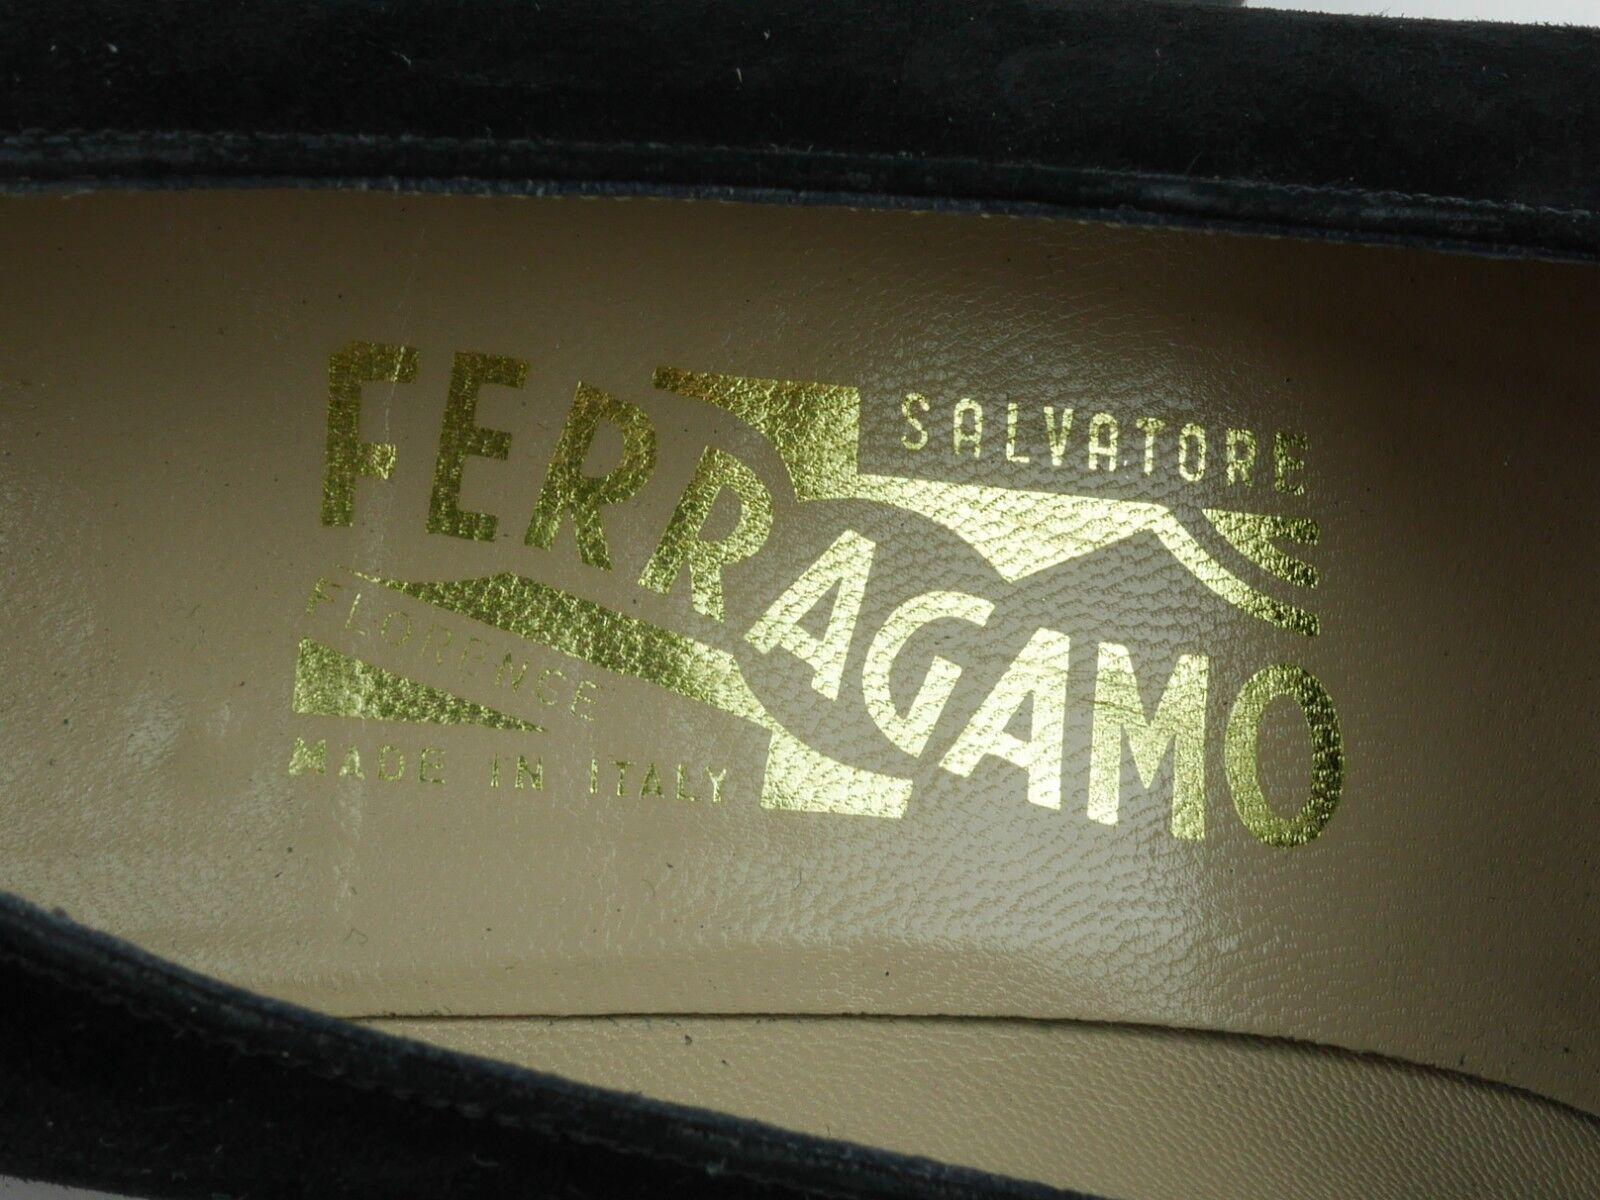 SALVATORE FERRAGAMO Women's 7 - - - BLACK SUEDE LEATHER CLOSED TOE HIGH HEELS PUMPS 7919fd